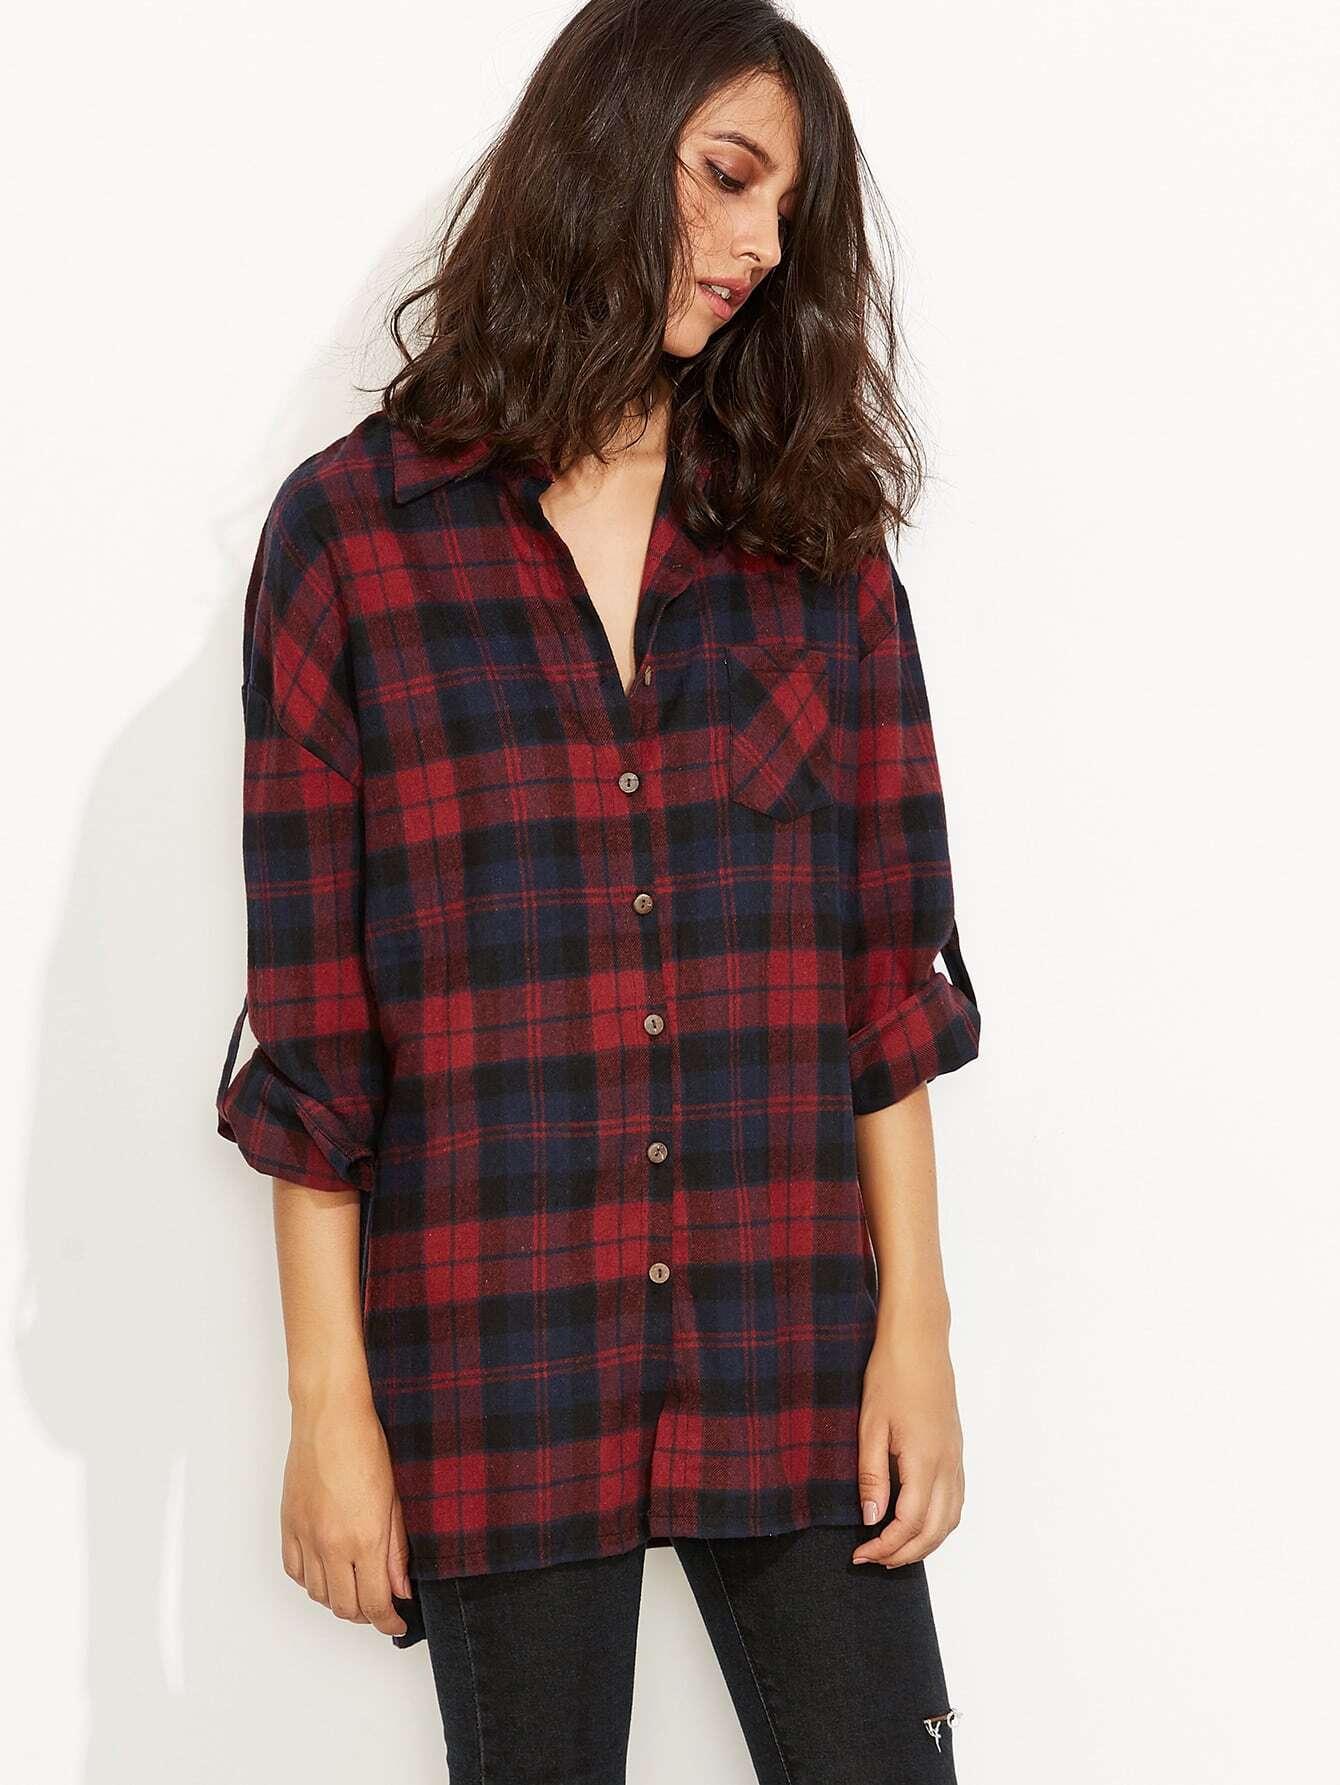 blouse160812303_2